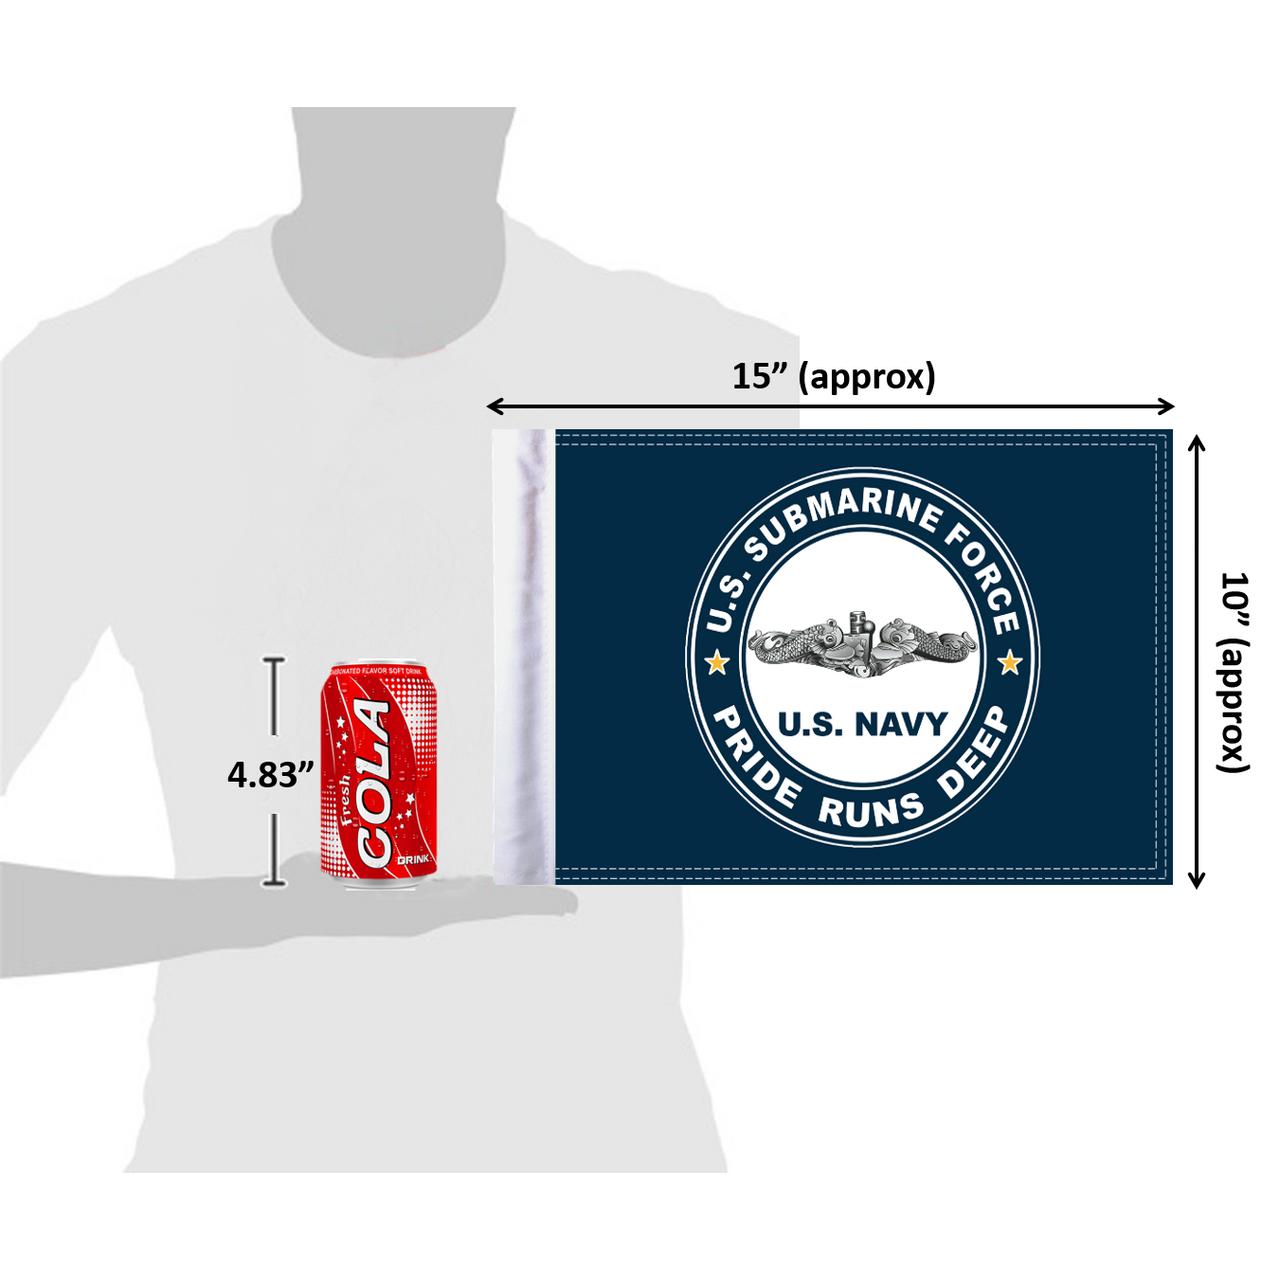 "10""x15"" U.S. Navy Submarine flag (size comparison view)"